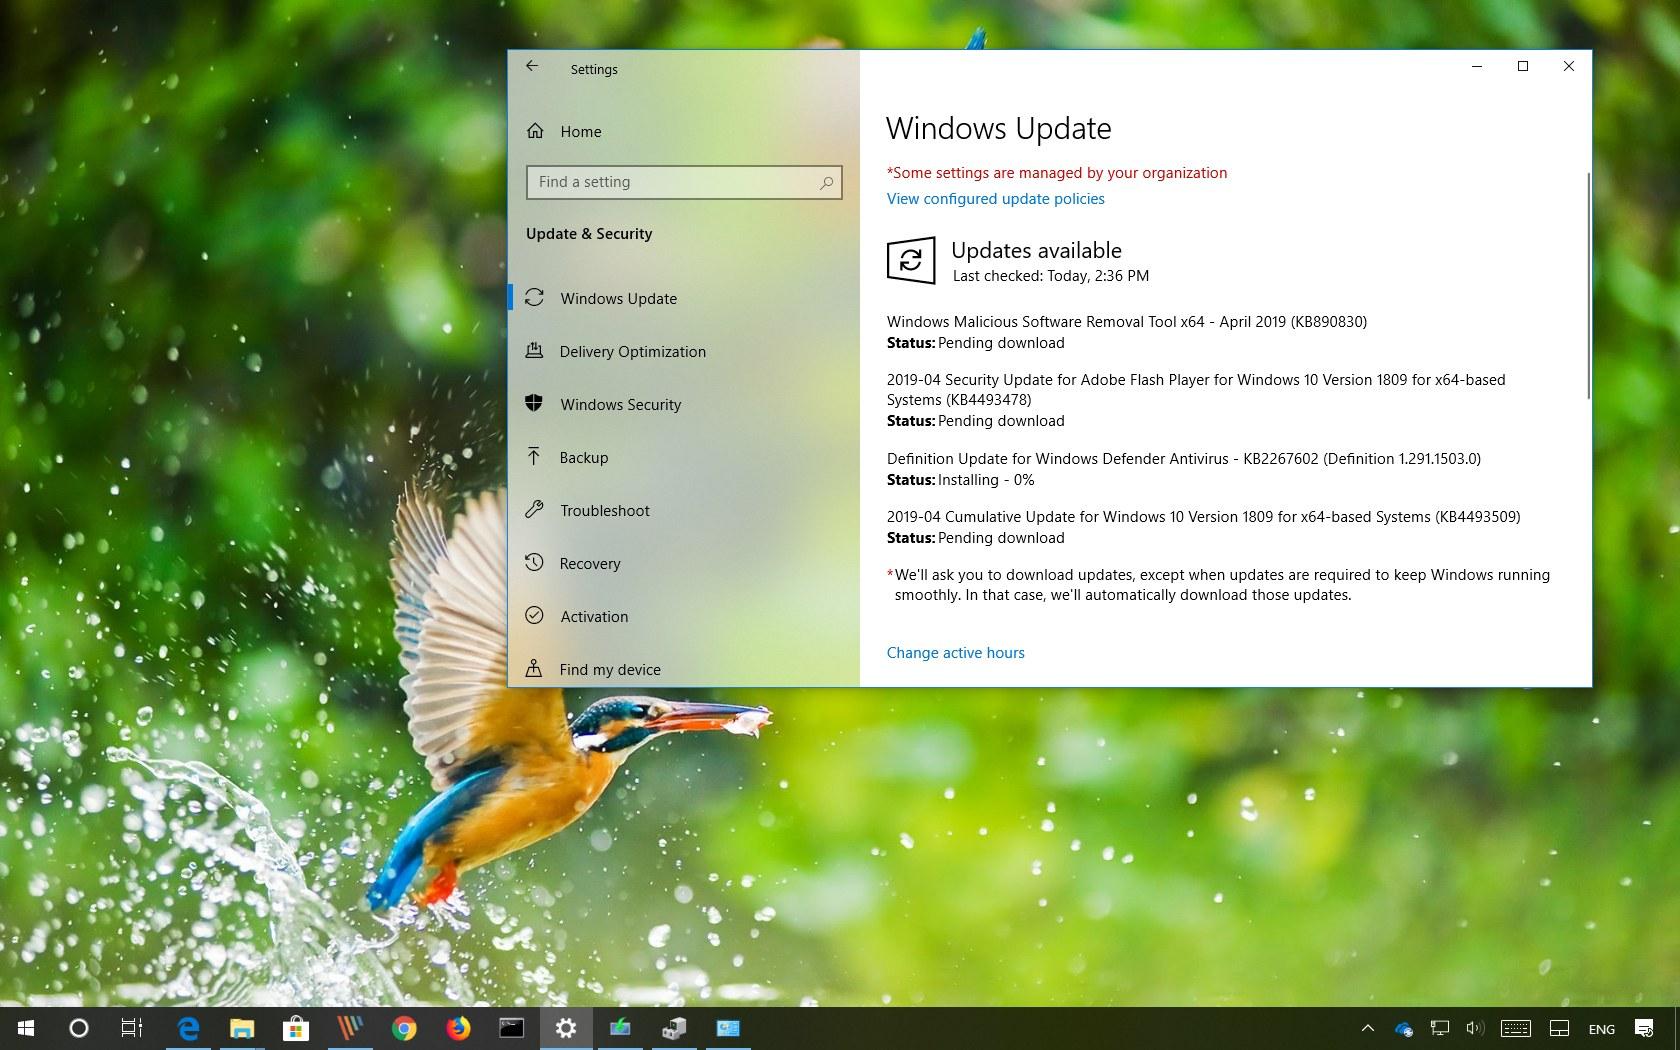 KB4493509 update for Windows 10 version 1809